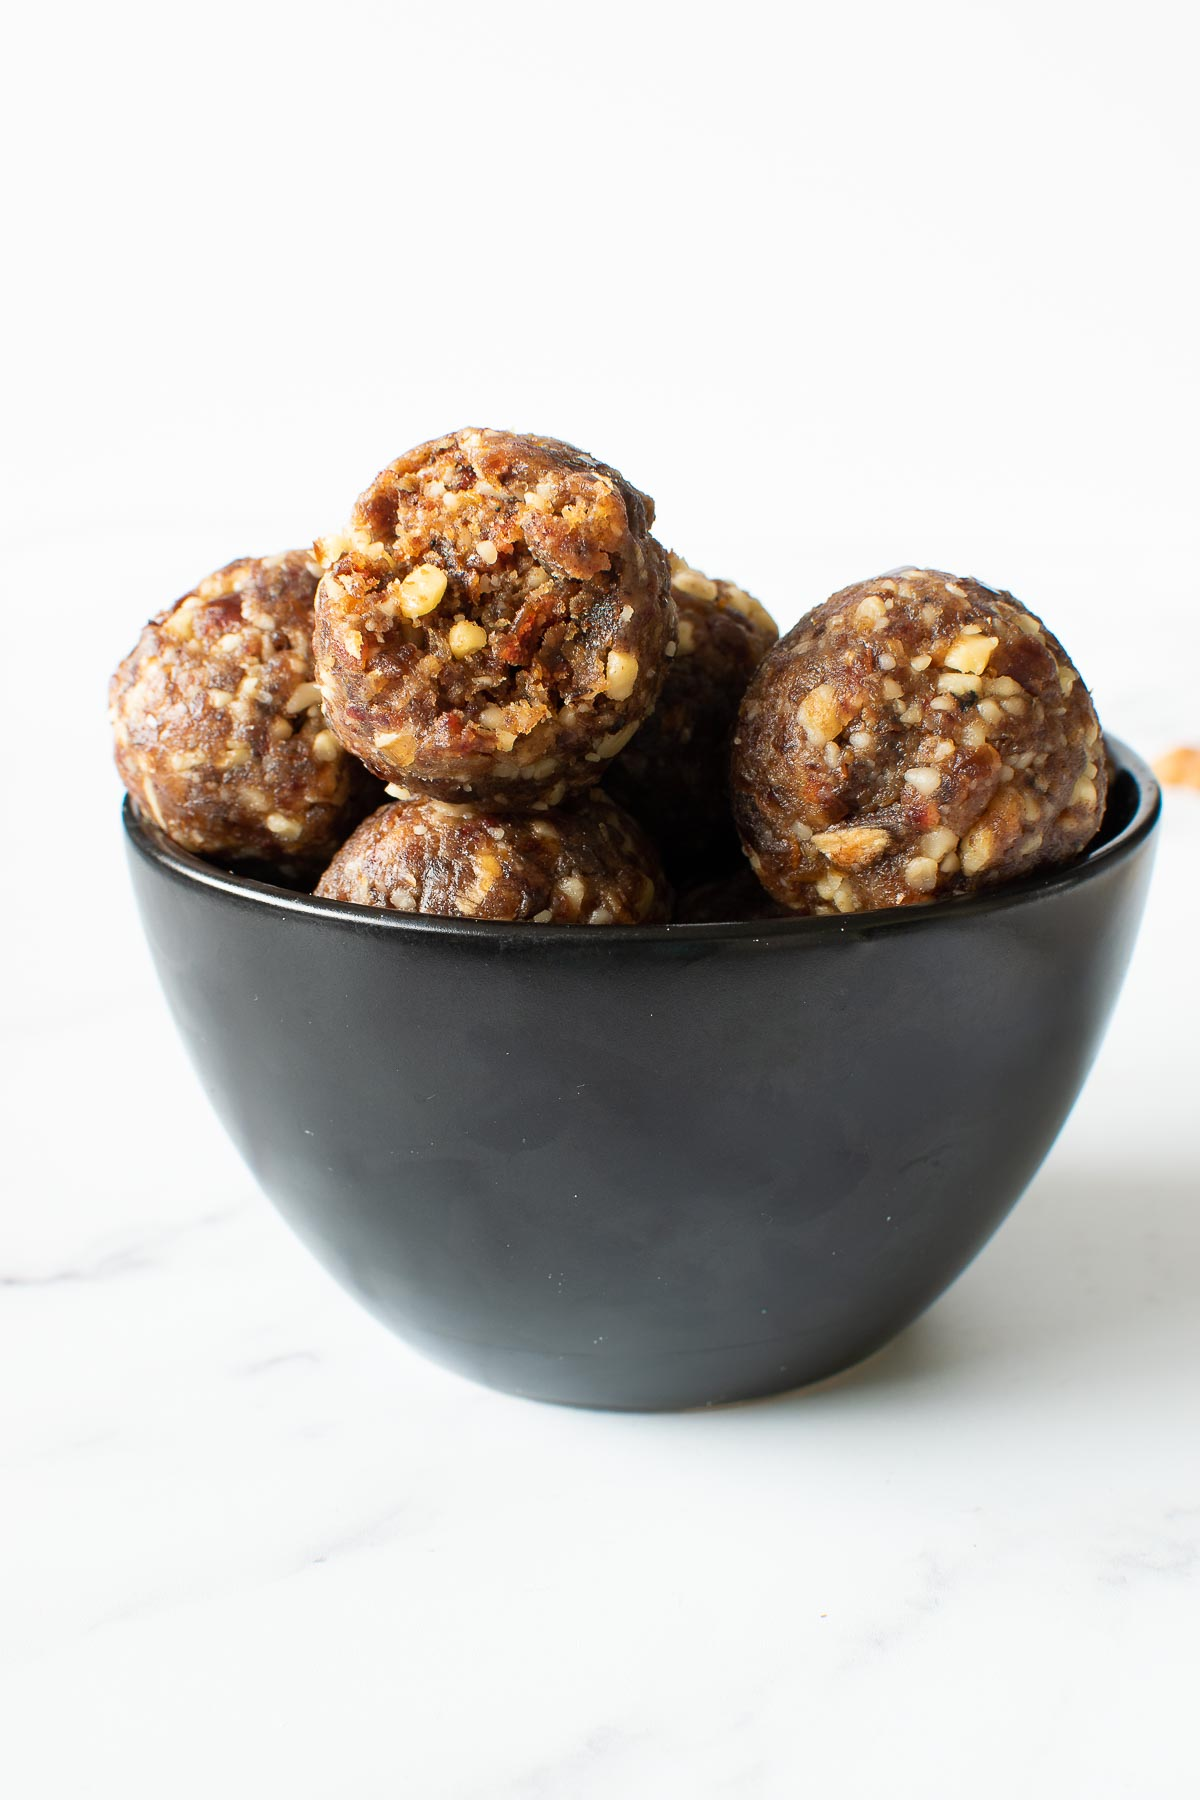 A bowl of homemade energy balls.